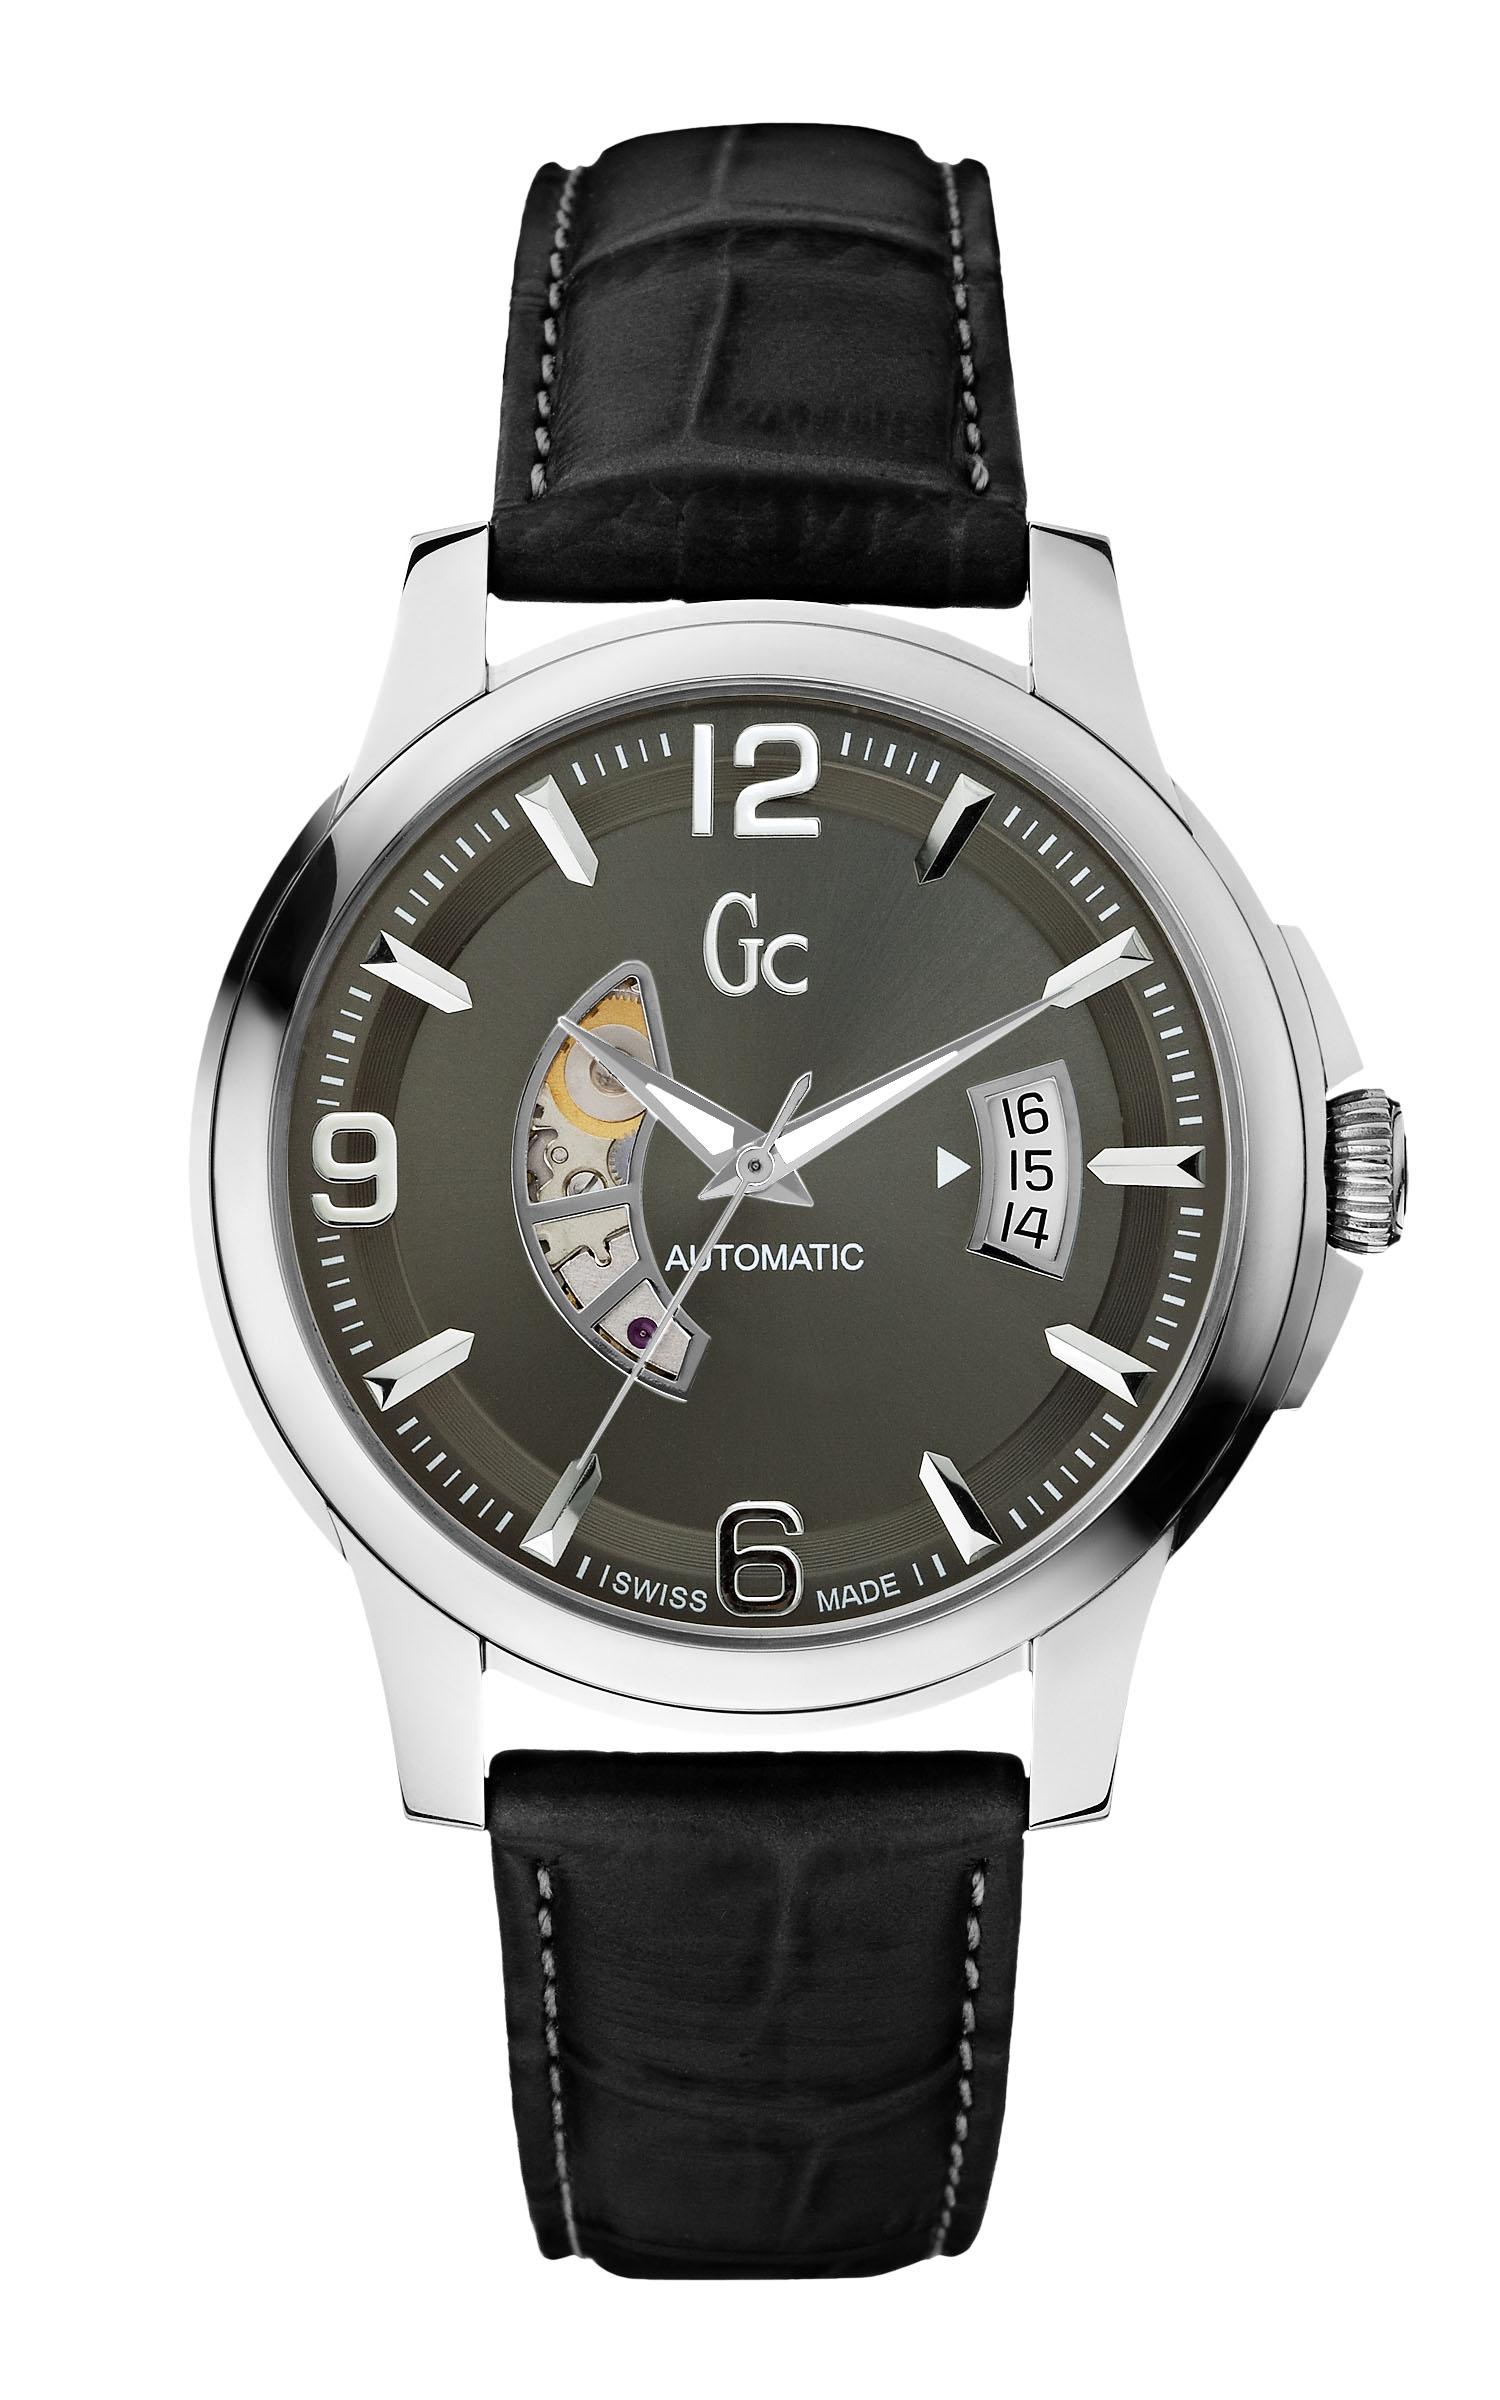 Reloj GC Smart Luxury Swiss Made